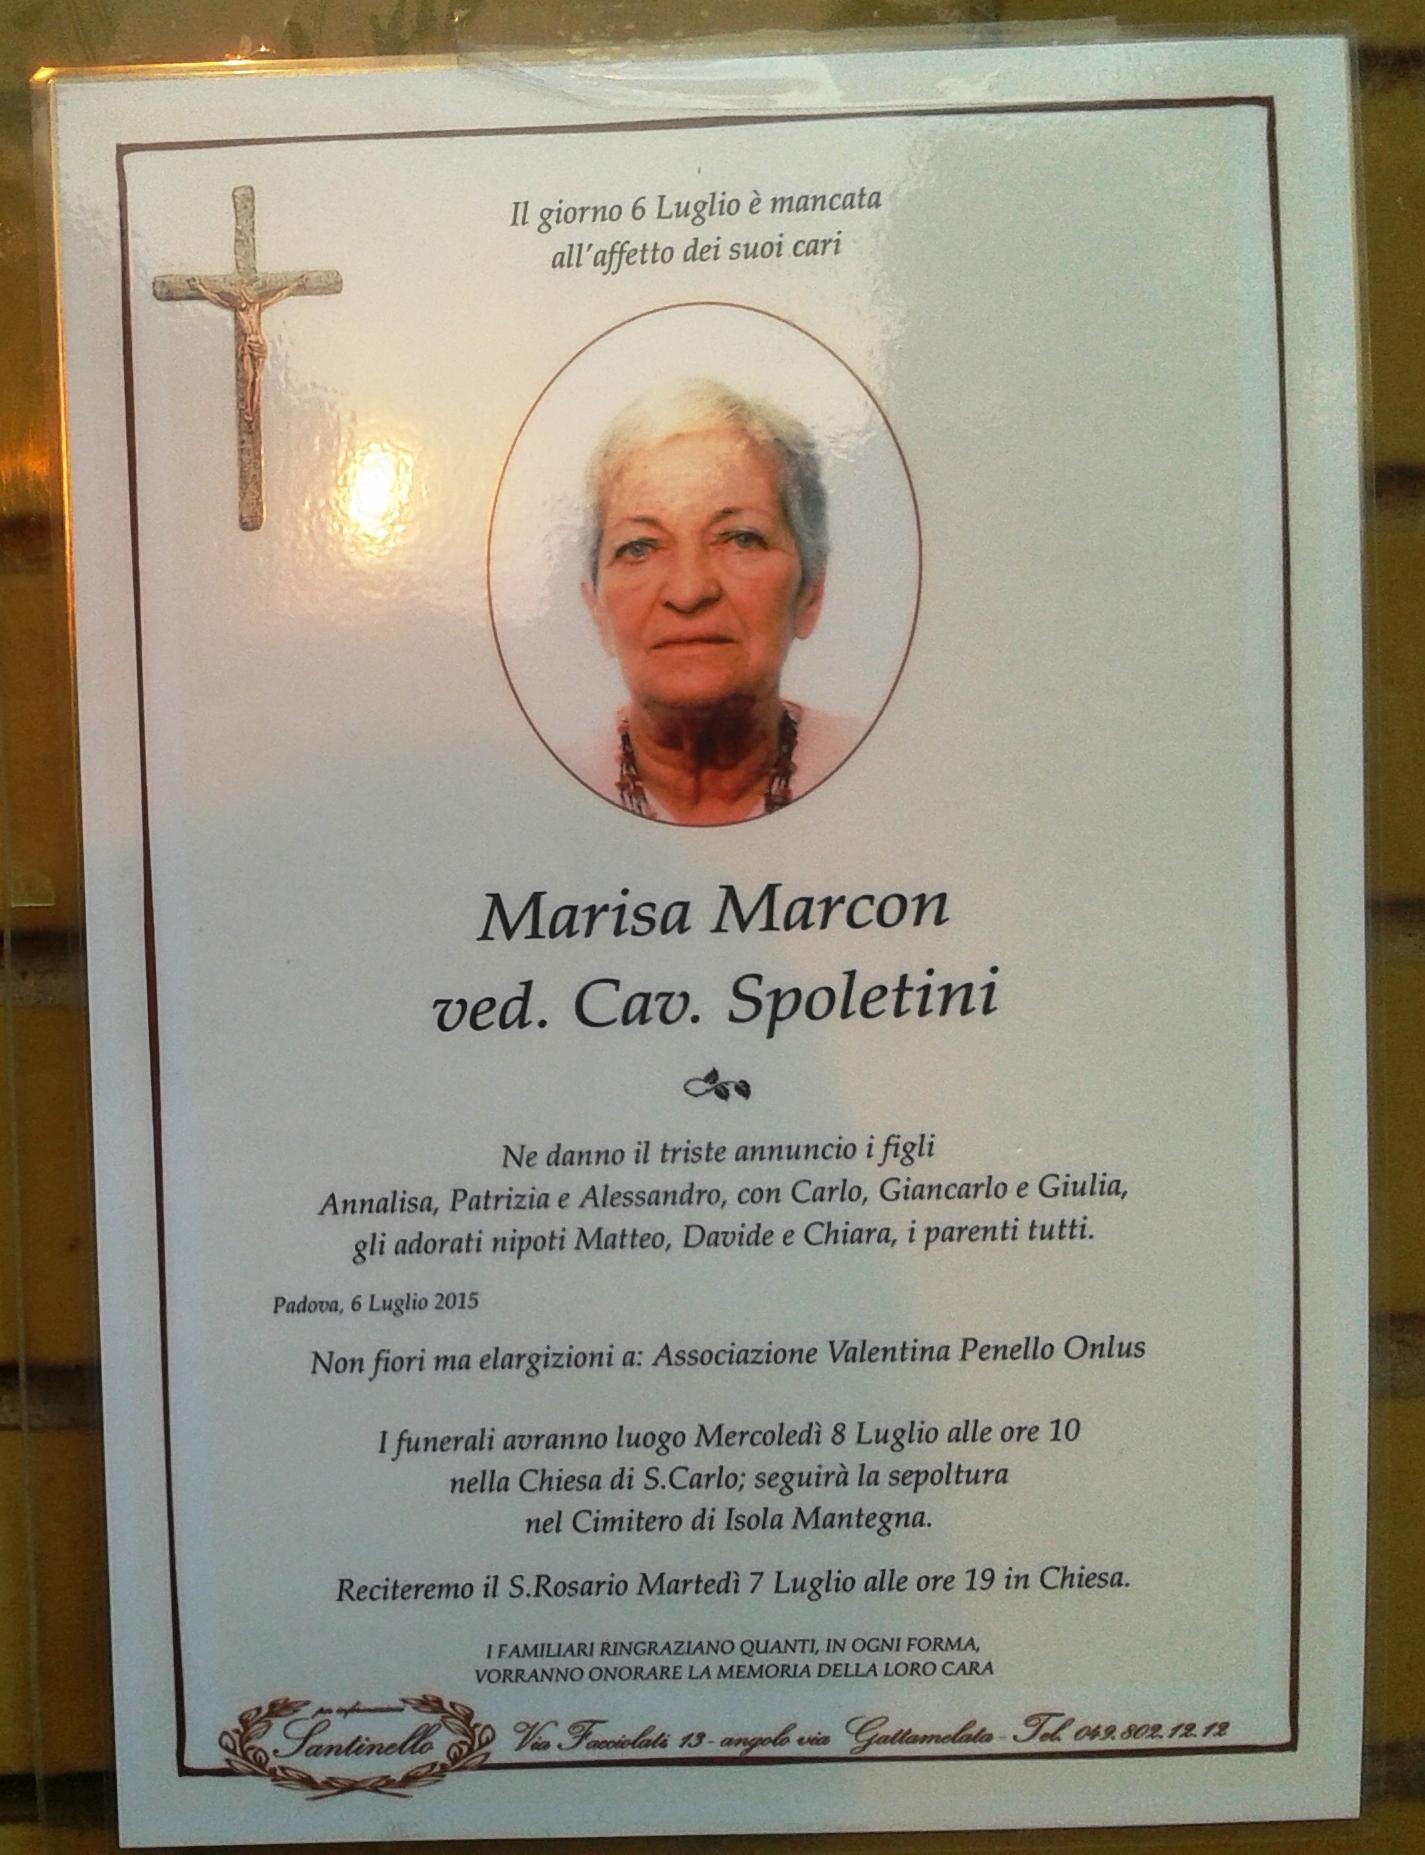 MariSaSpoletini